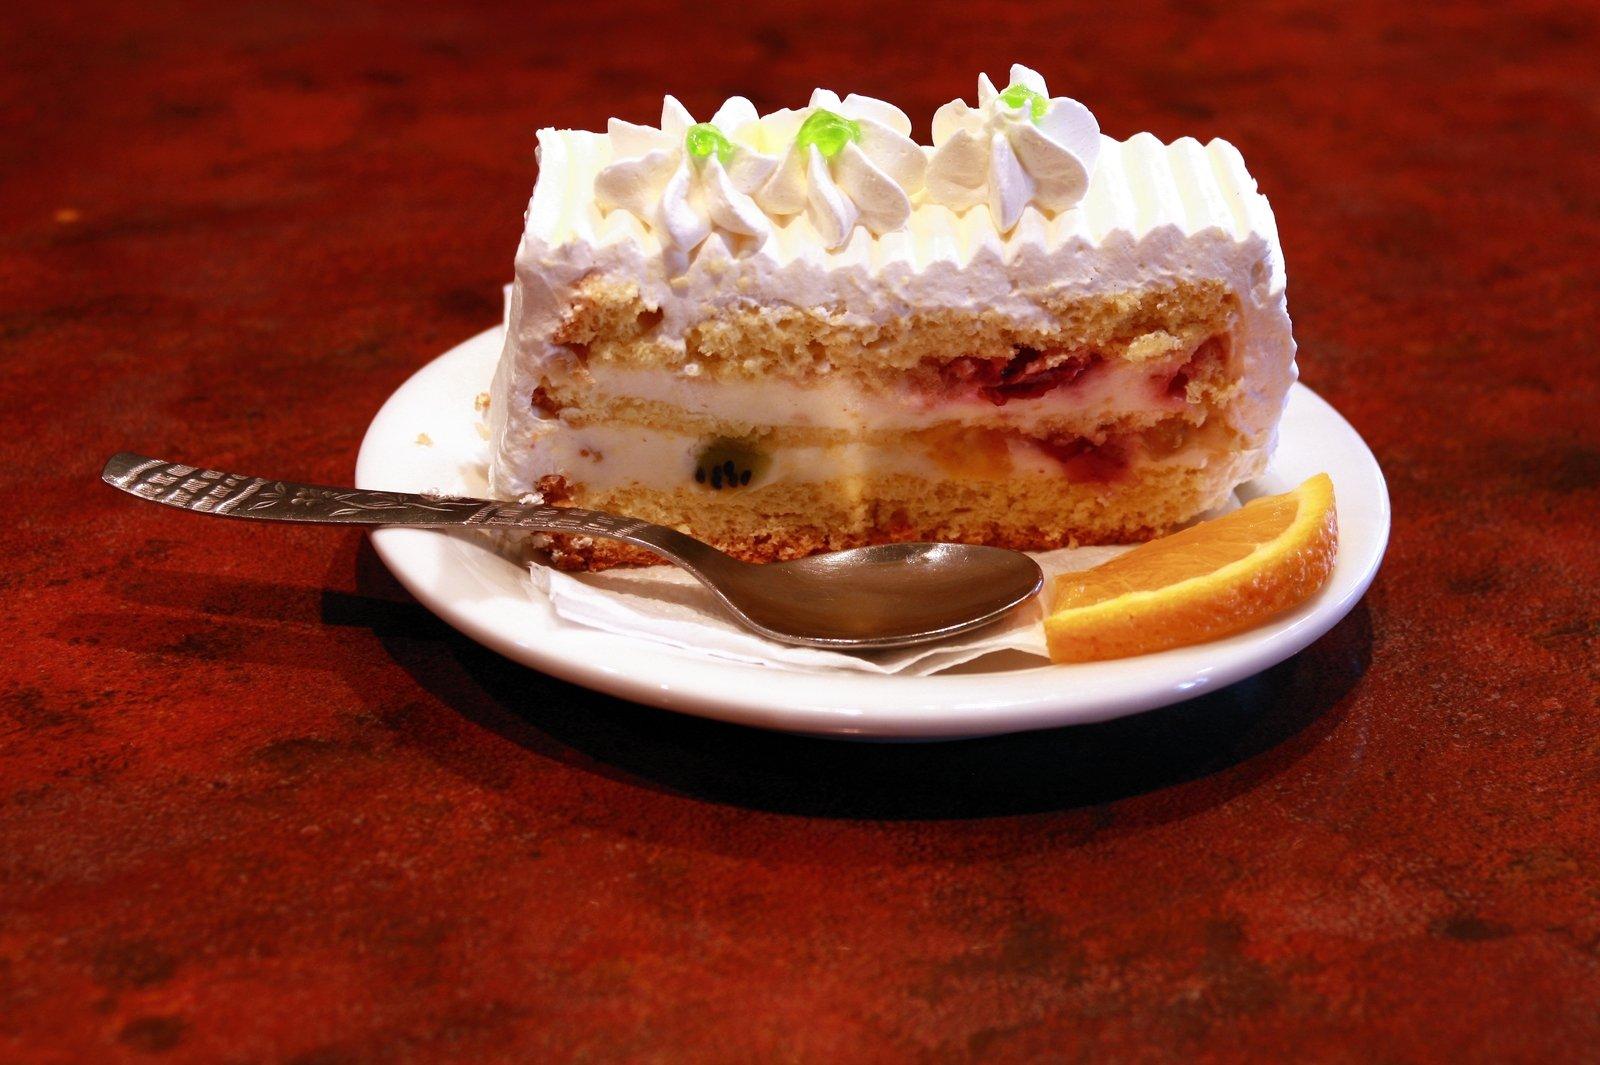 Kostenlose Analcreme Kuchen Kapernanal-Sex